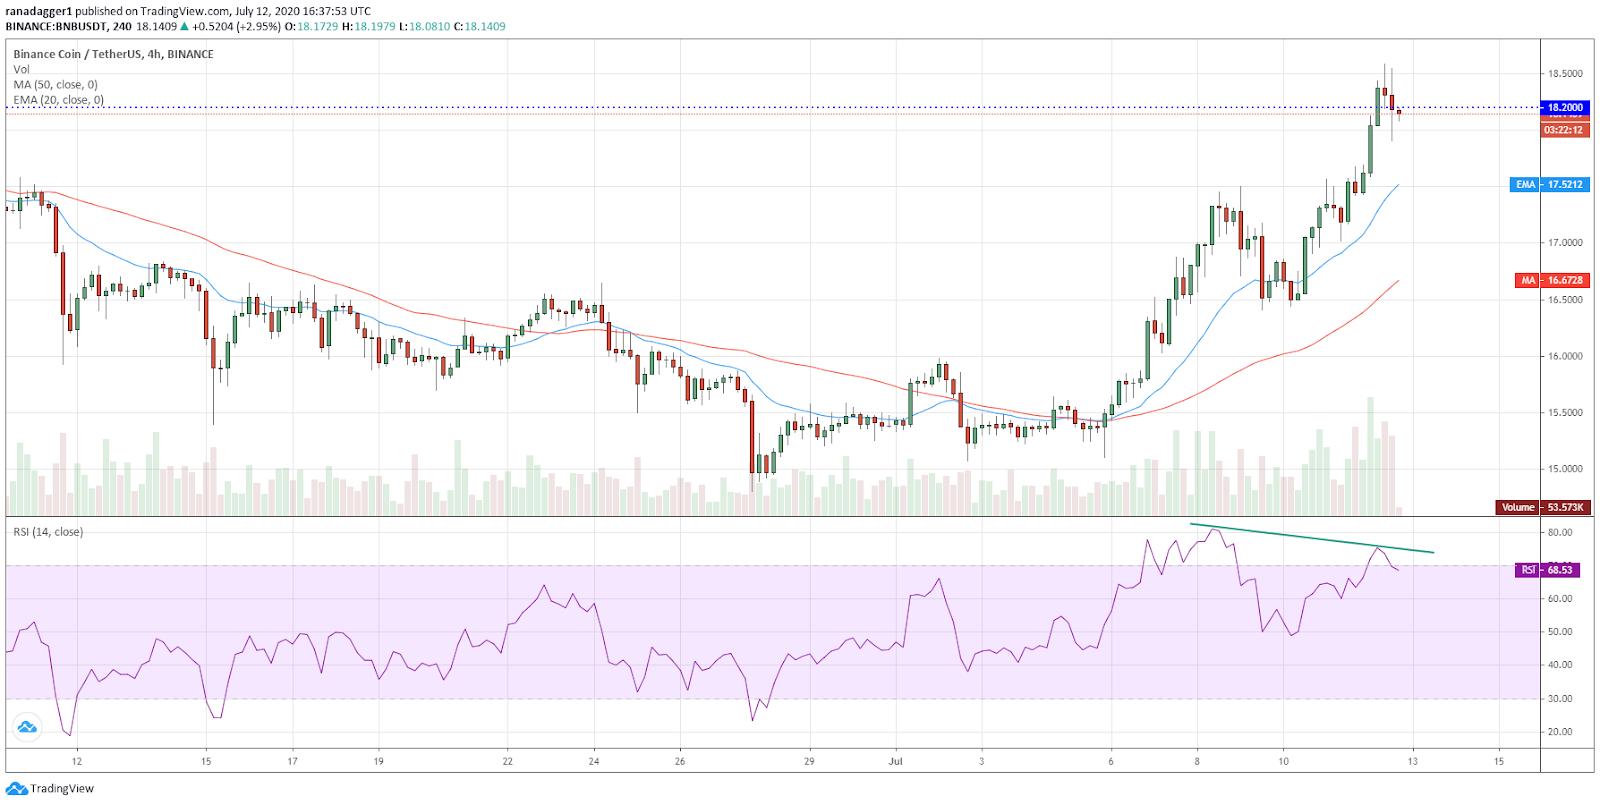 BNB/USD 4-hour chart. Source: TradingView